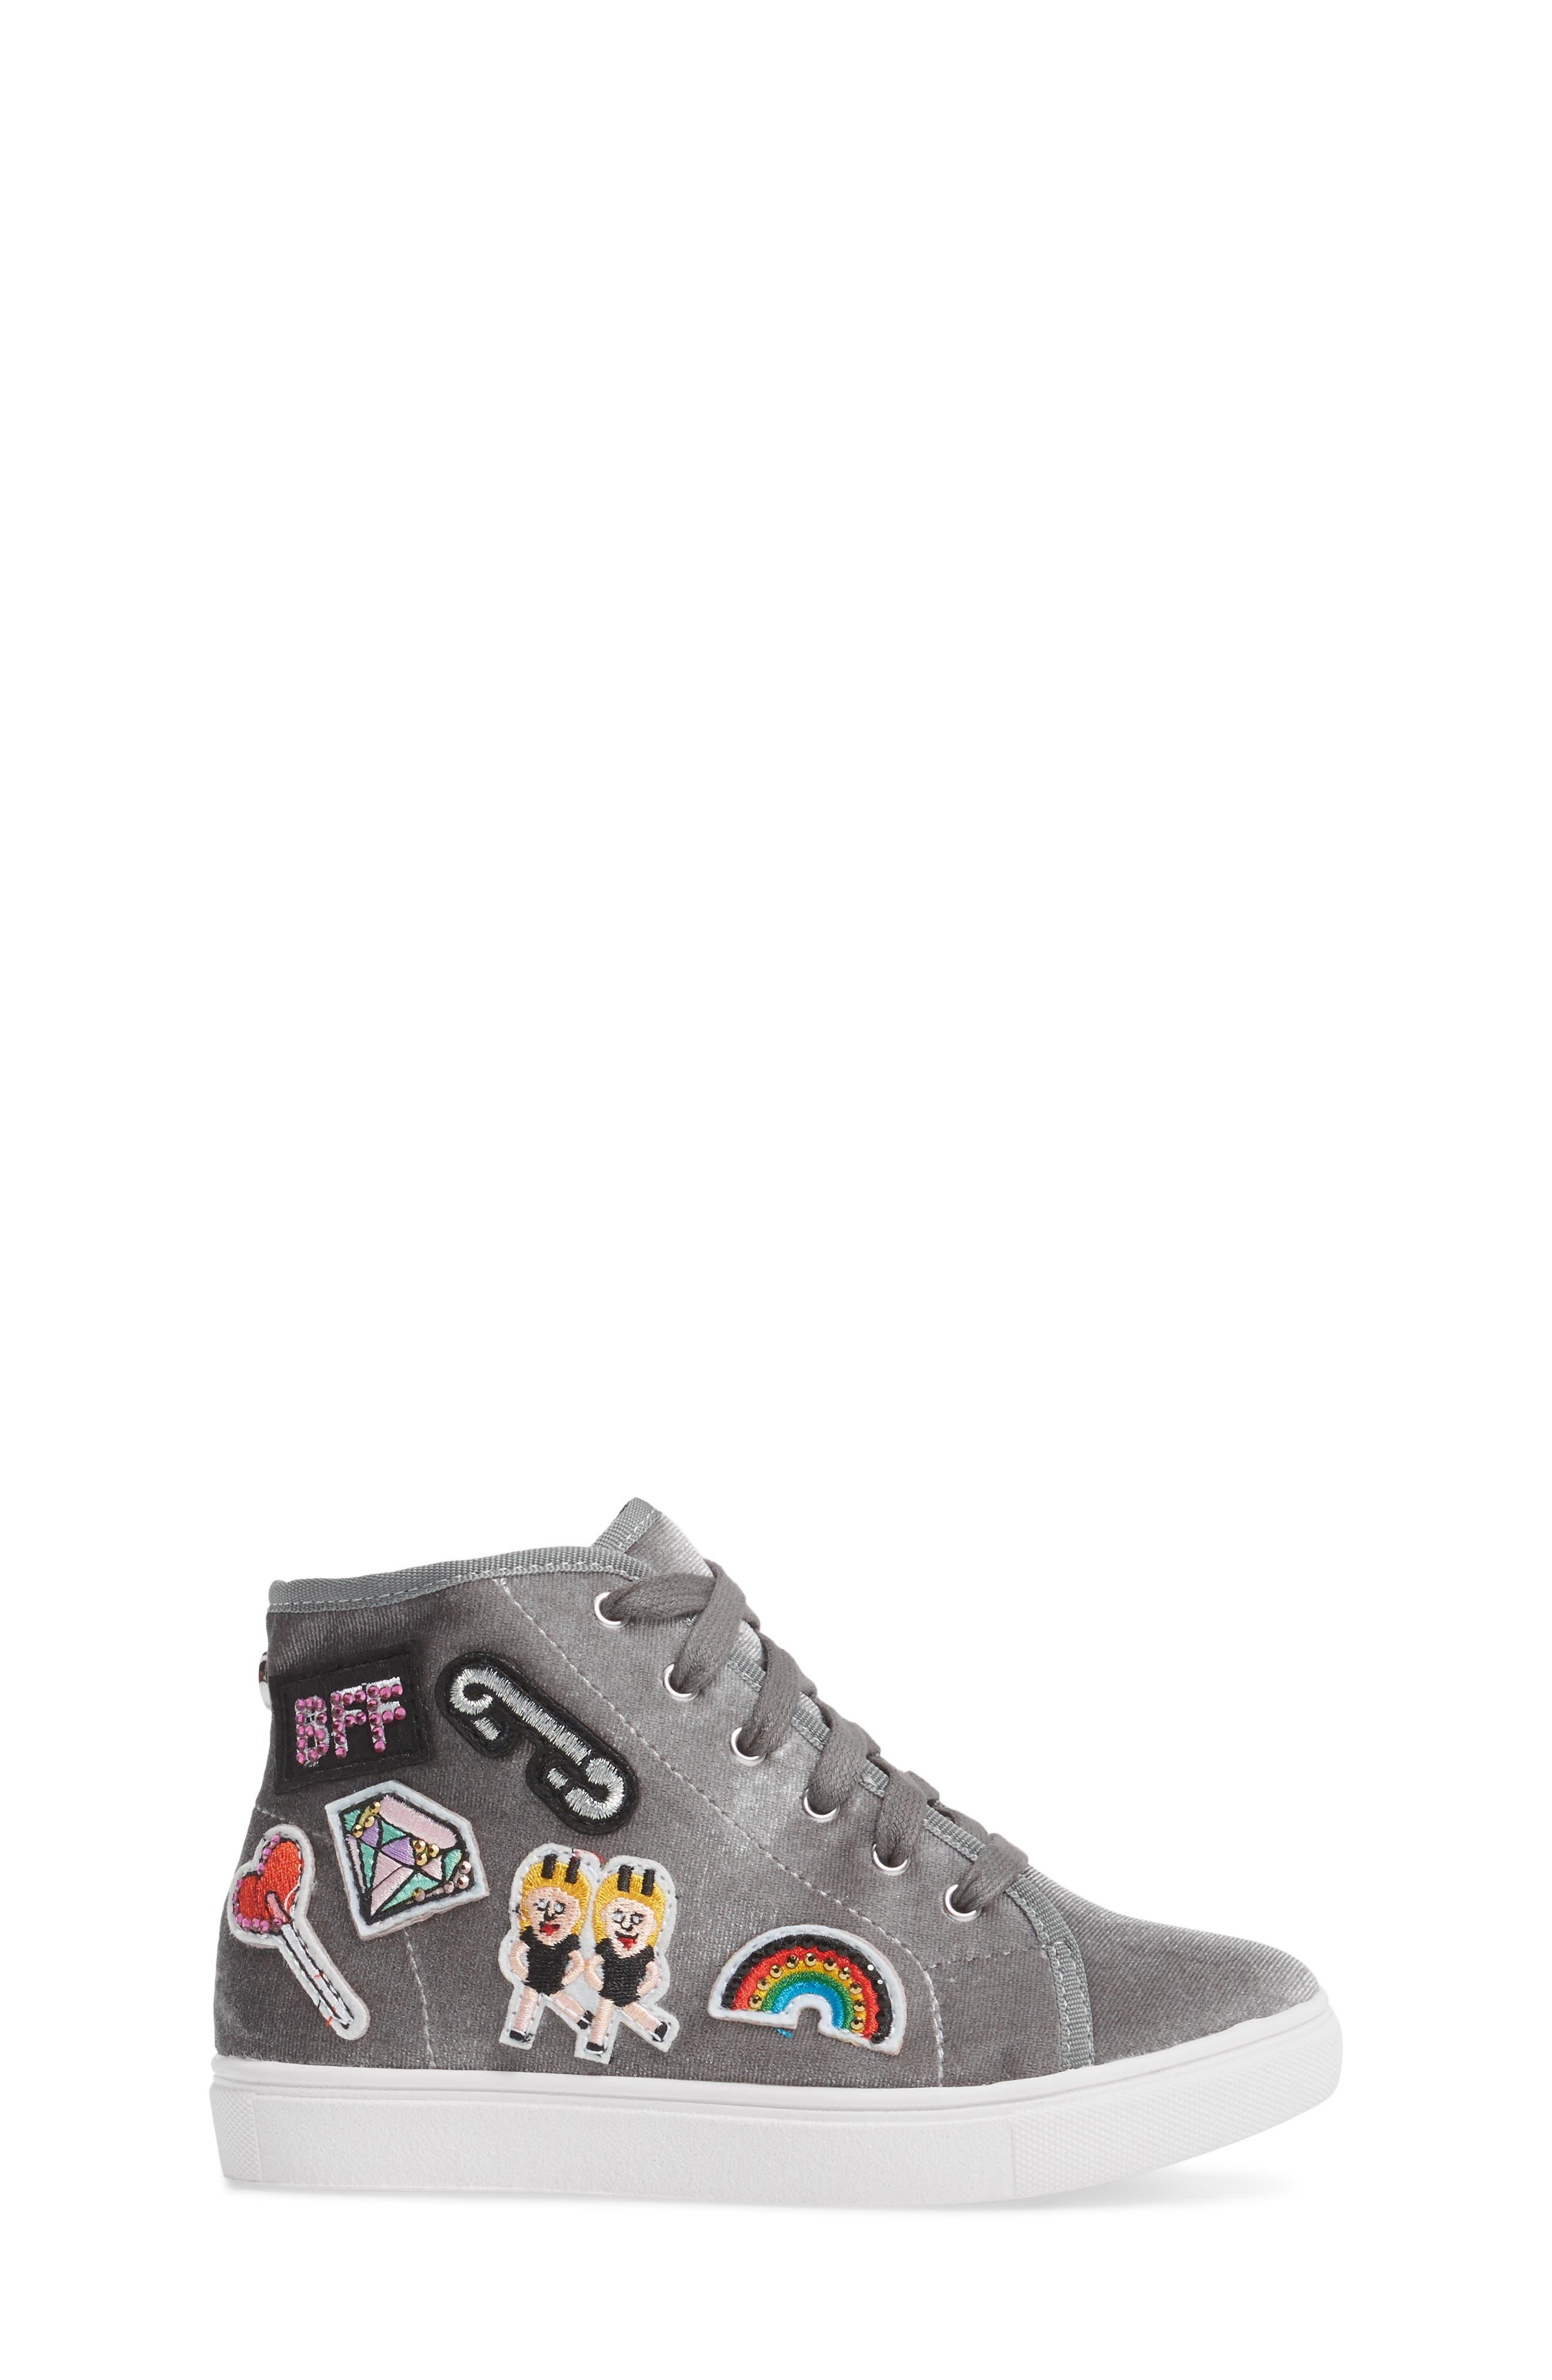 J-BFF High Top Sneaker,                             Alternate thumbnail 3, color,                             055